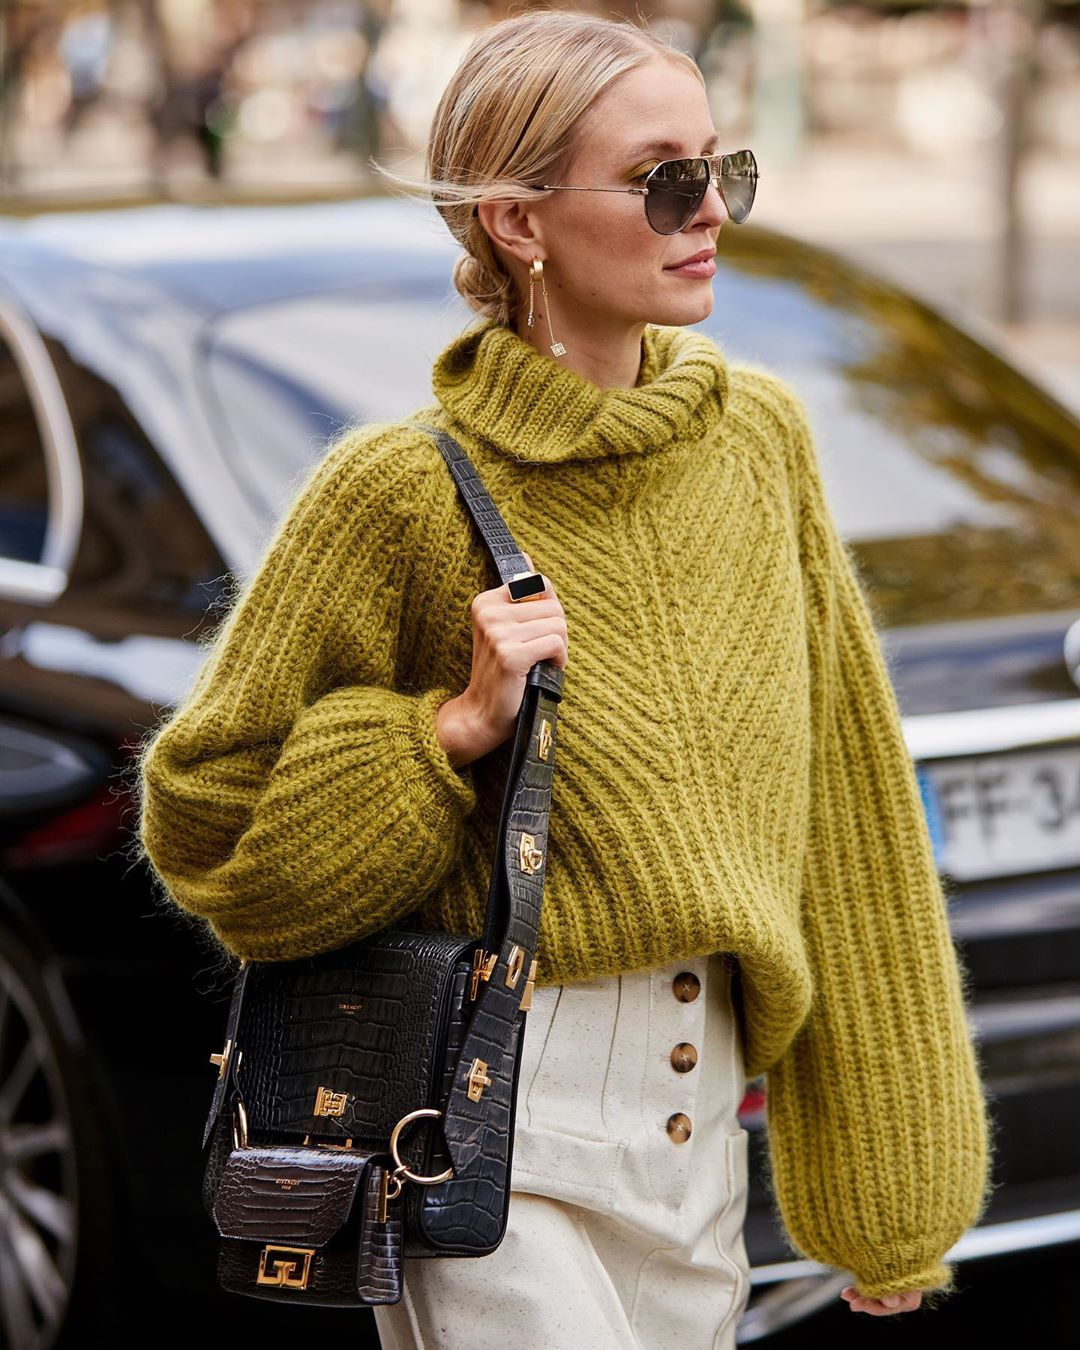 "Street Style Stars on Instagram: ""@leoniehanne photo by @thestylestalkercom - #Fashion #OOTD #Style #InstaFashion #Vintage #FashionBlogger #Fashionista #StreetStyle #Stylish…"""